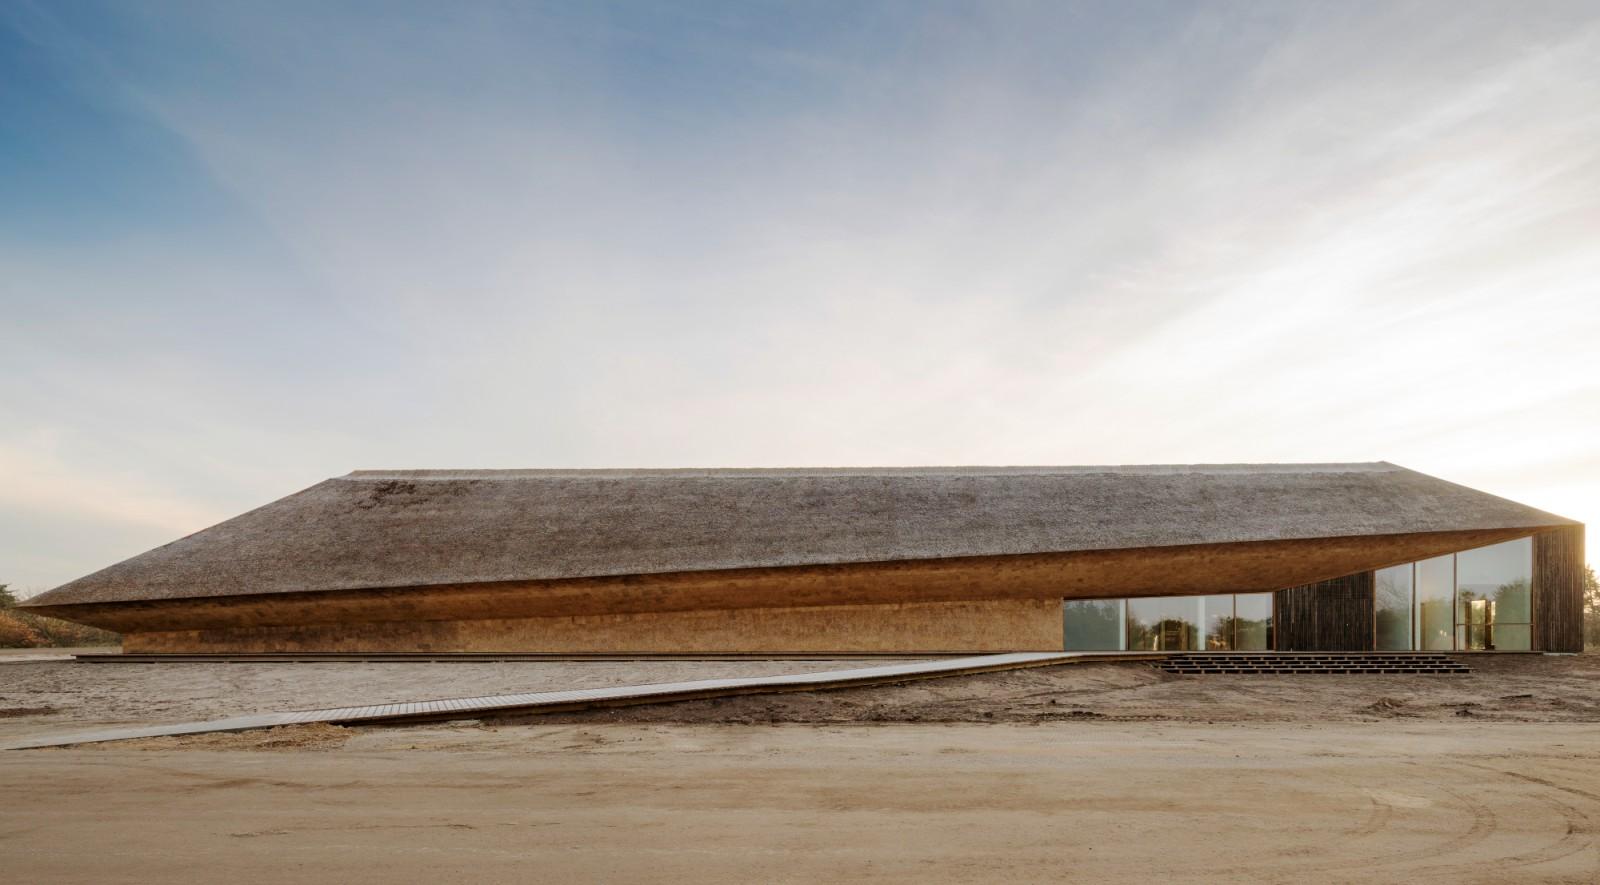 The new Danish Wadden Sea Centre